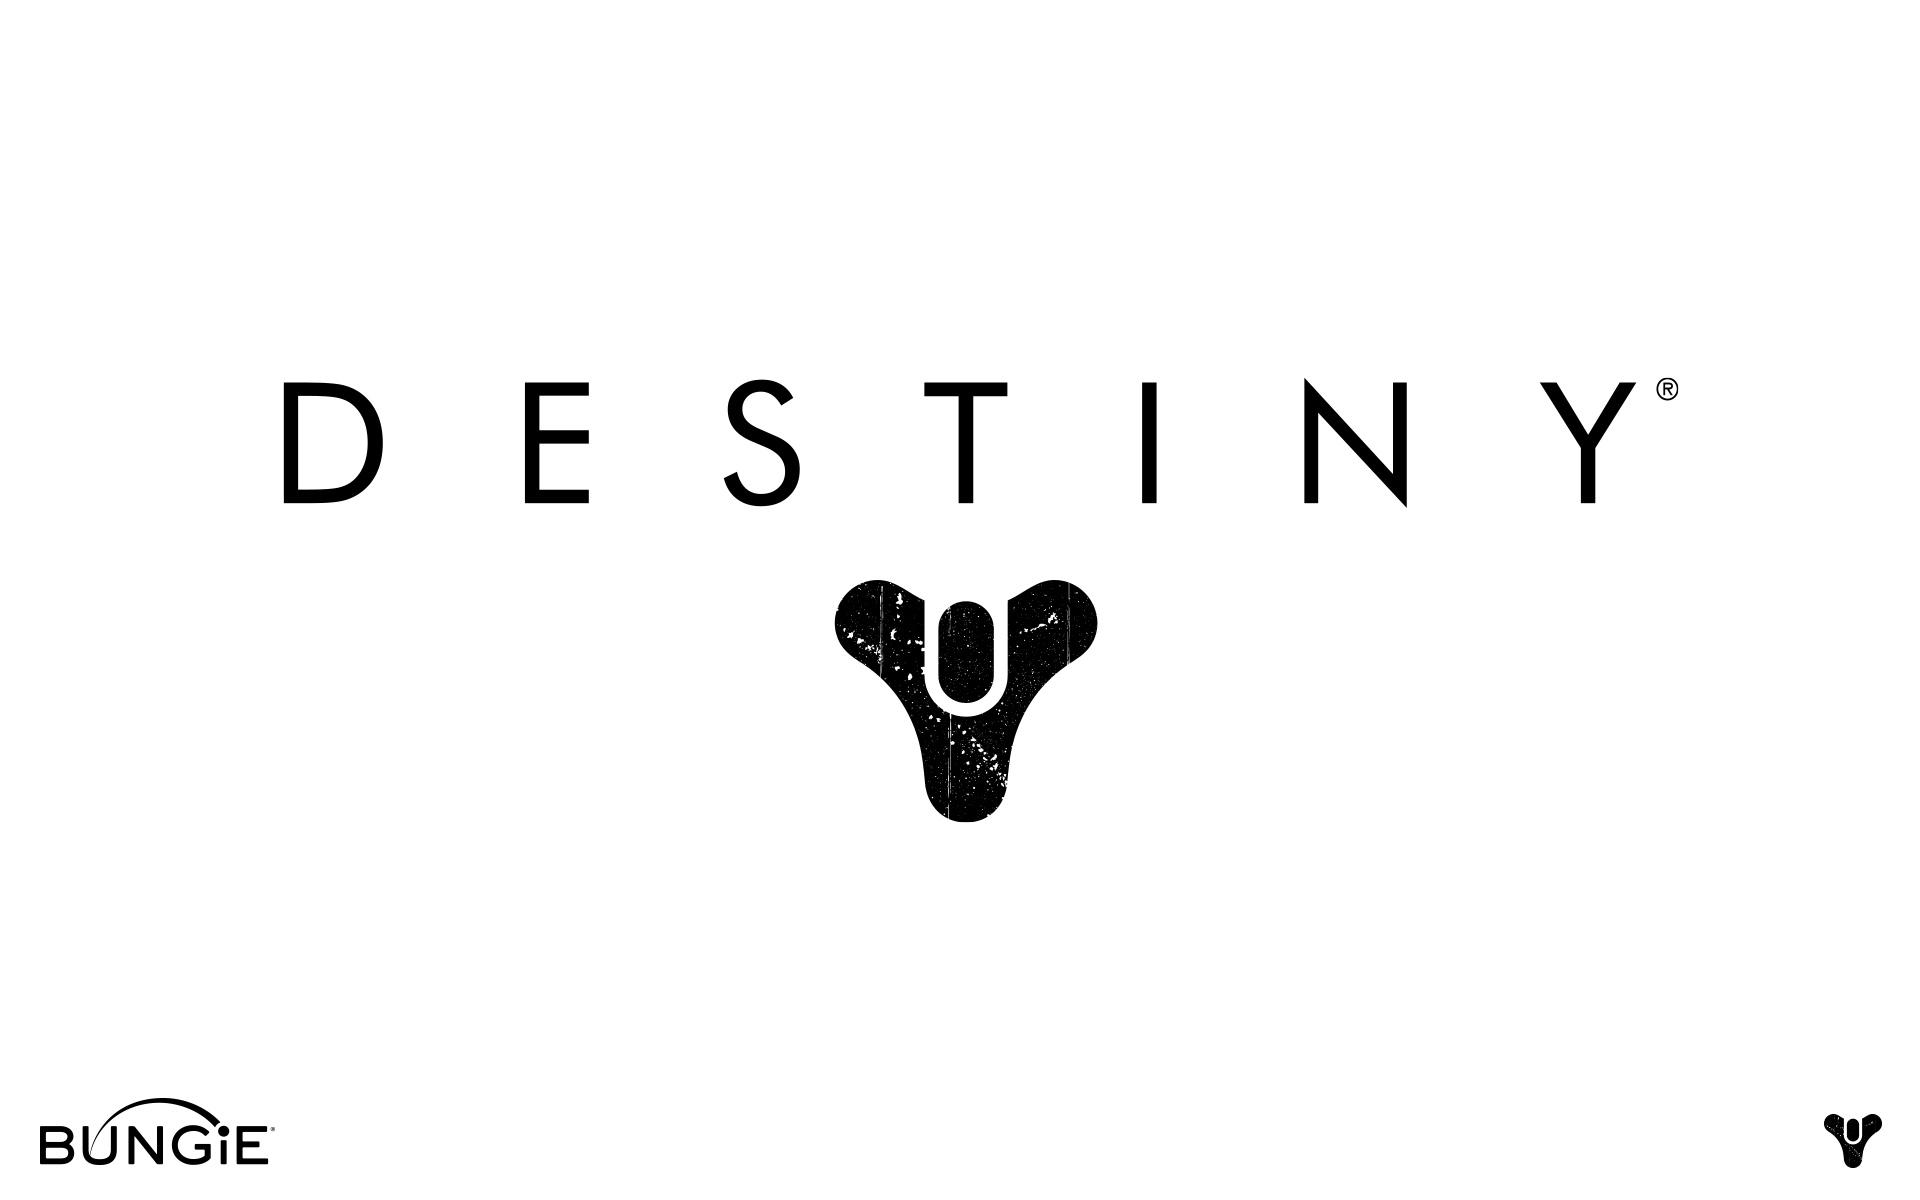 destiny logo hd - photo #7